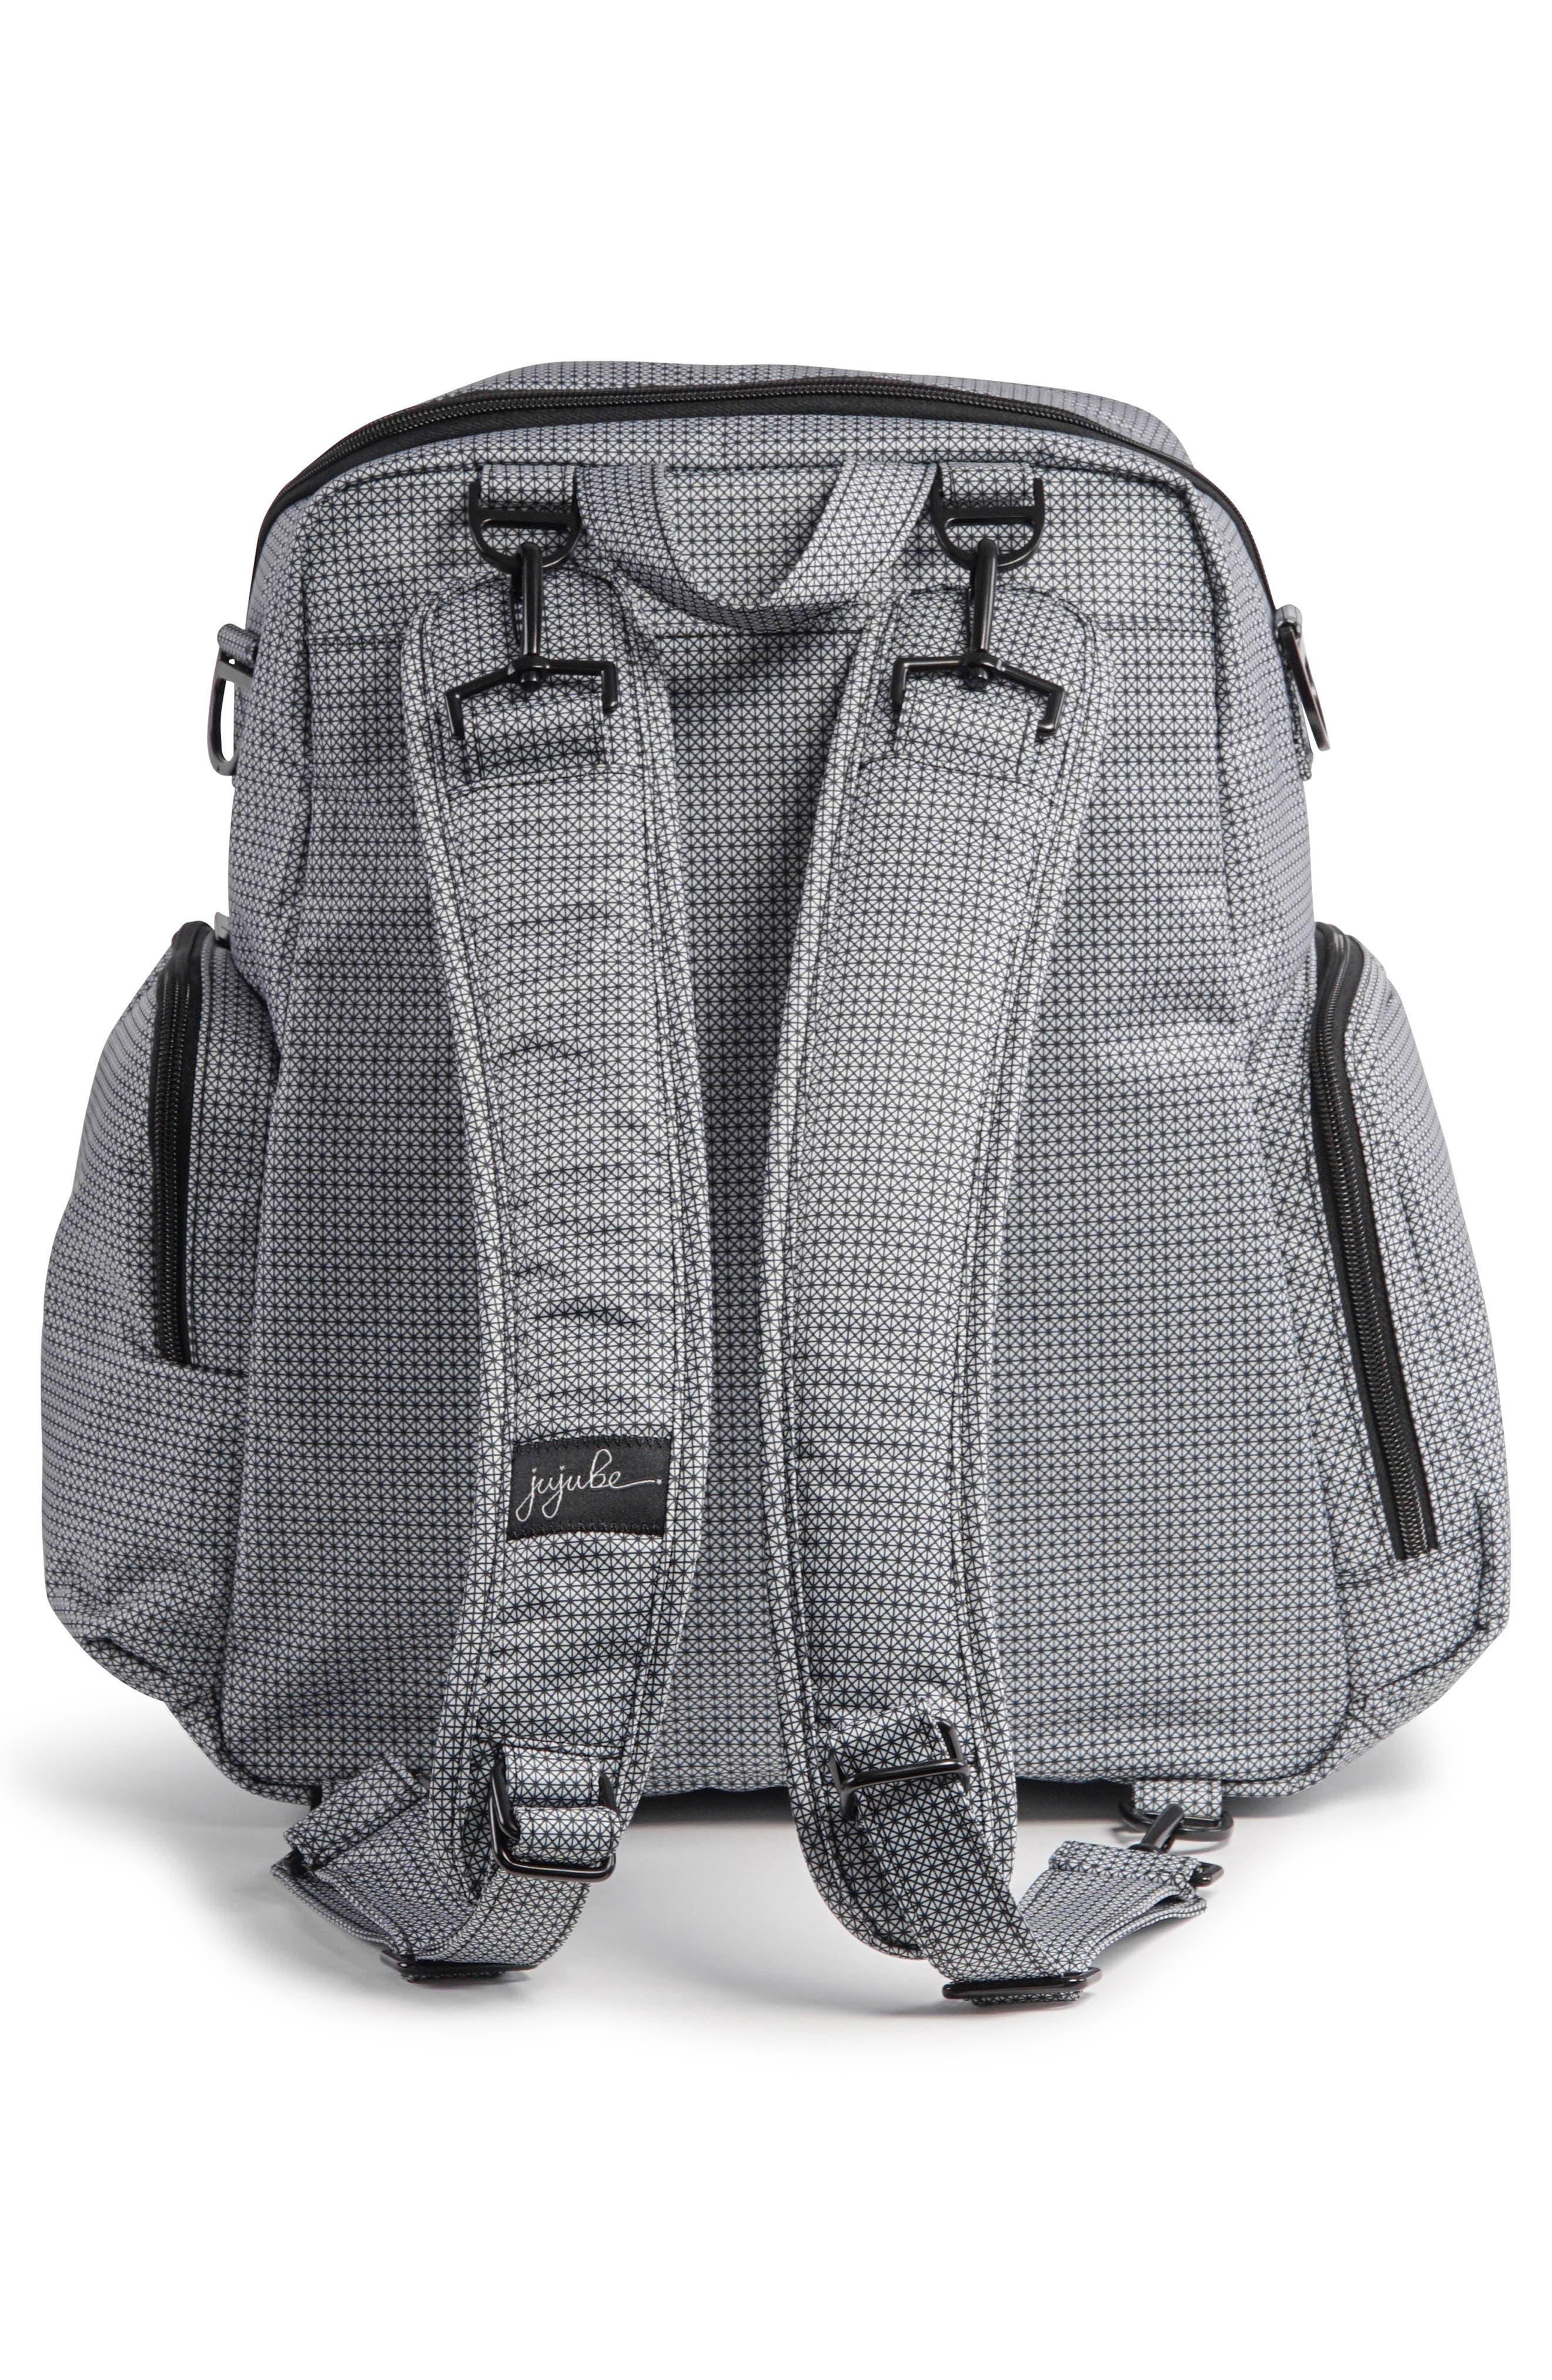 Be Nurtured Pumping Backpack,                             Alternate thumbnail 3, color,                             BLACK MATRIX